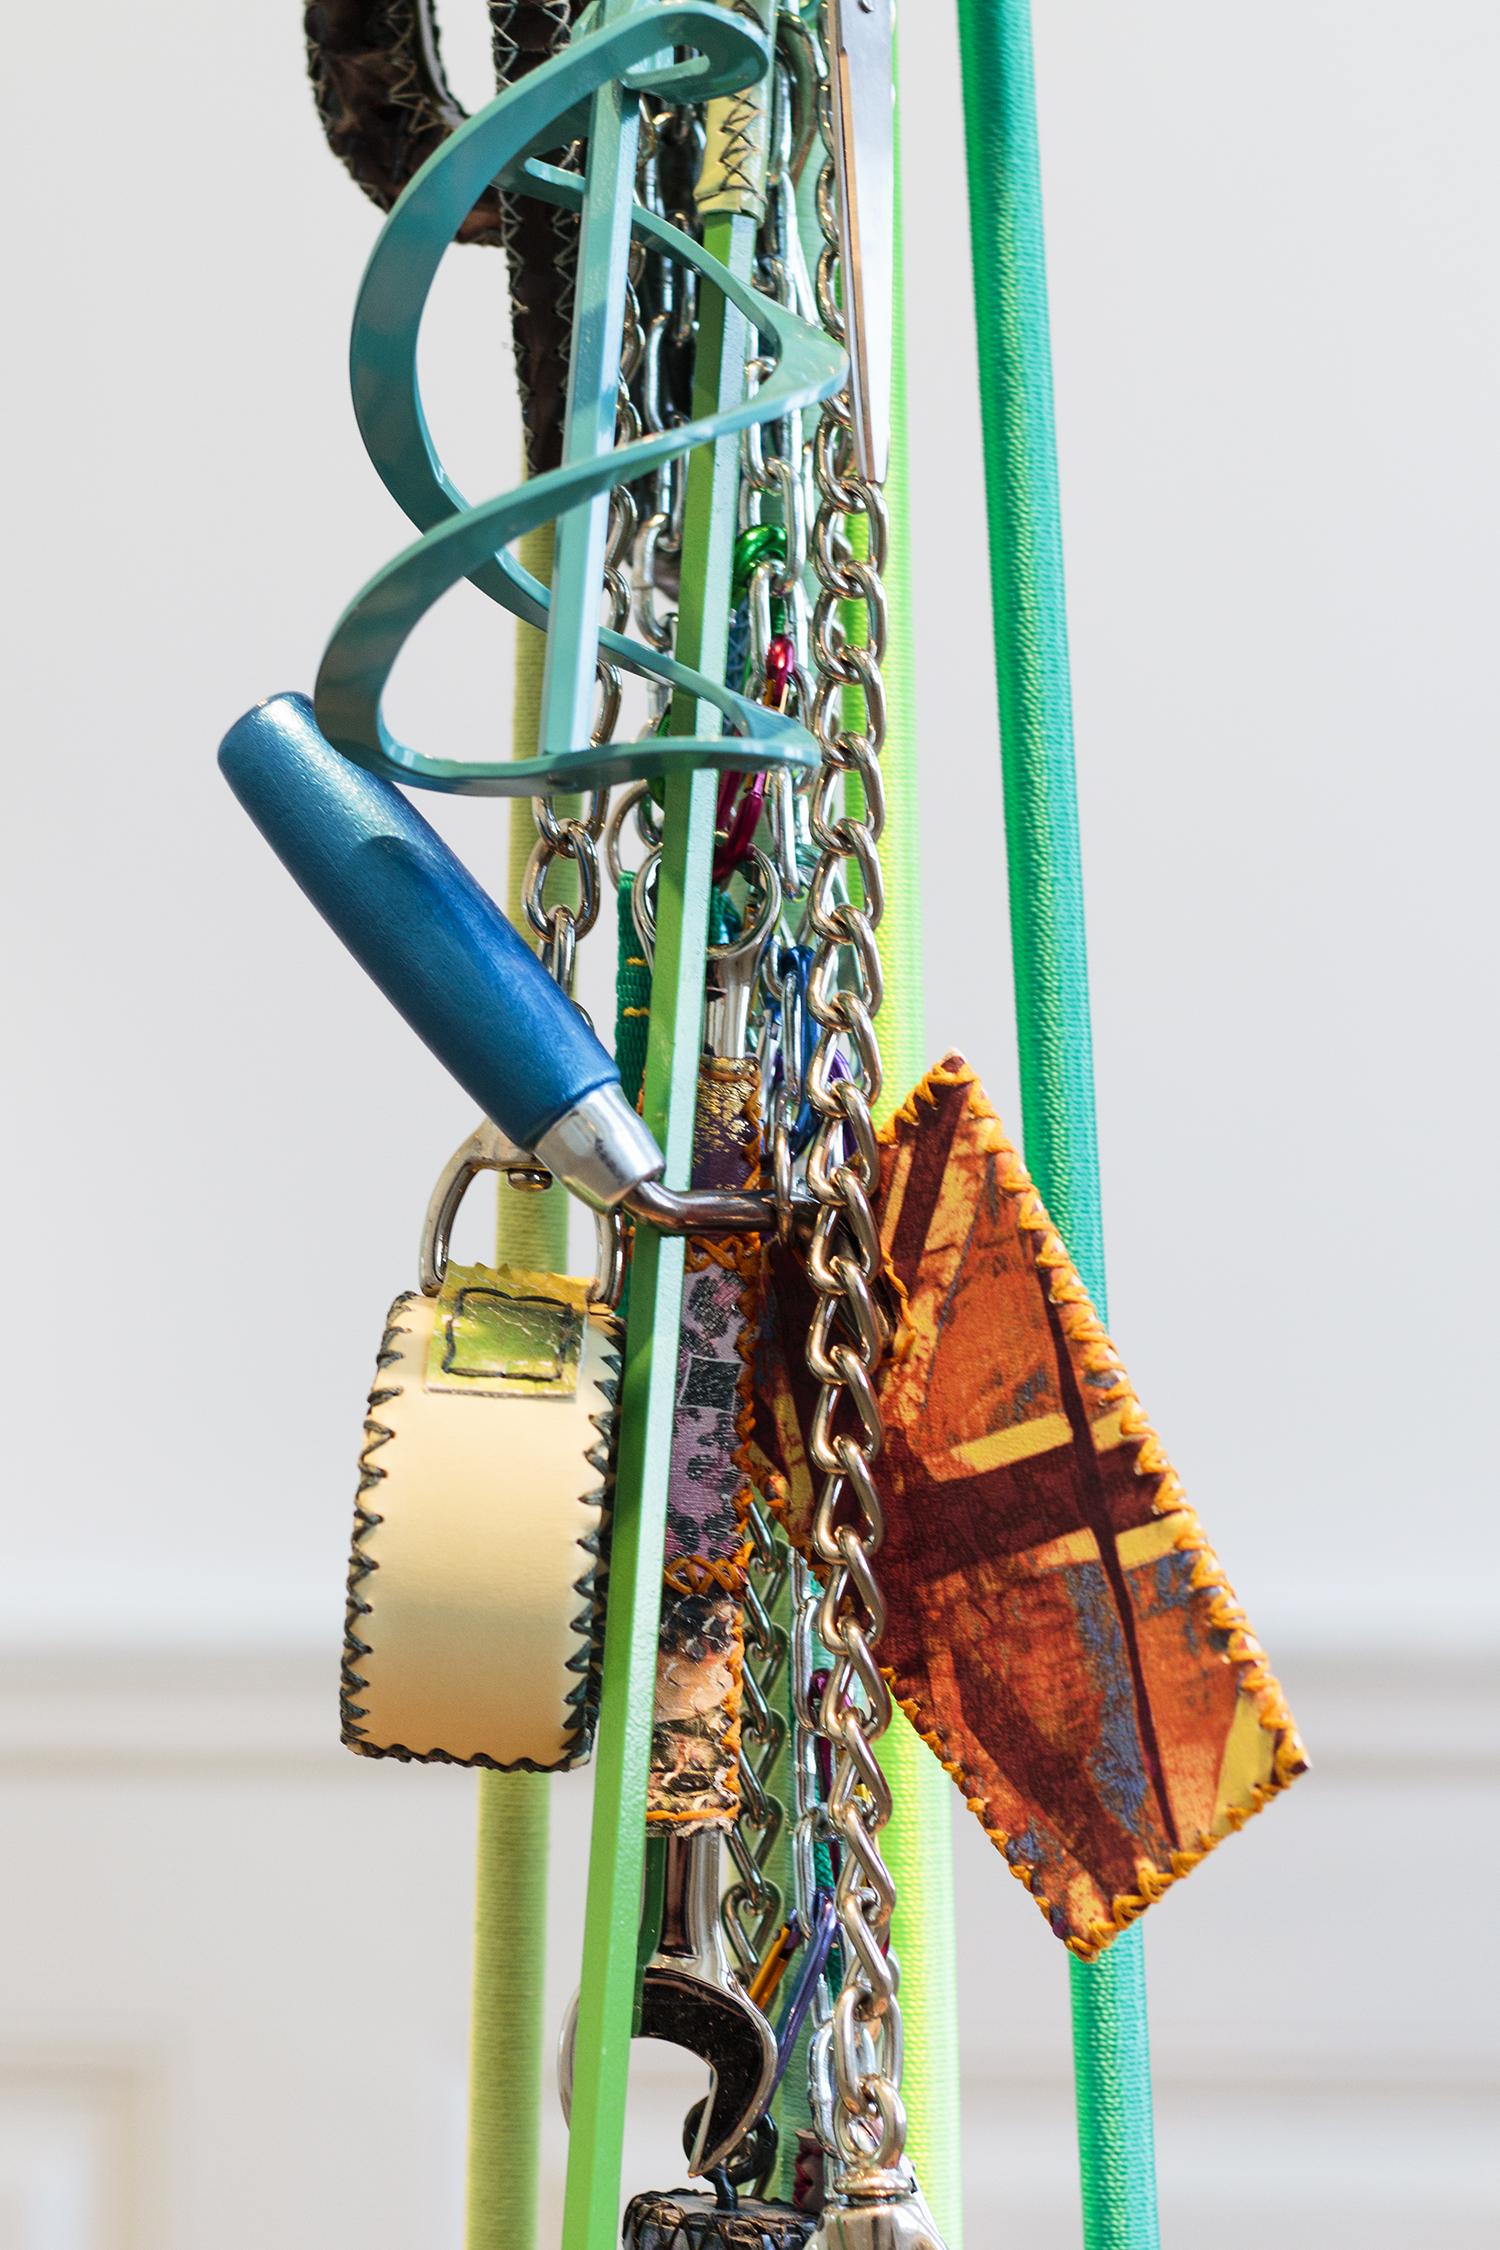 Maiken Bent, Swing #3 (Detalje)   Foto: Rikke Luna & Matias © I DO ART Agency.